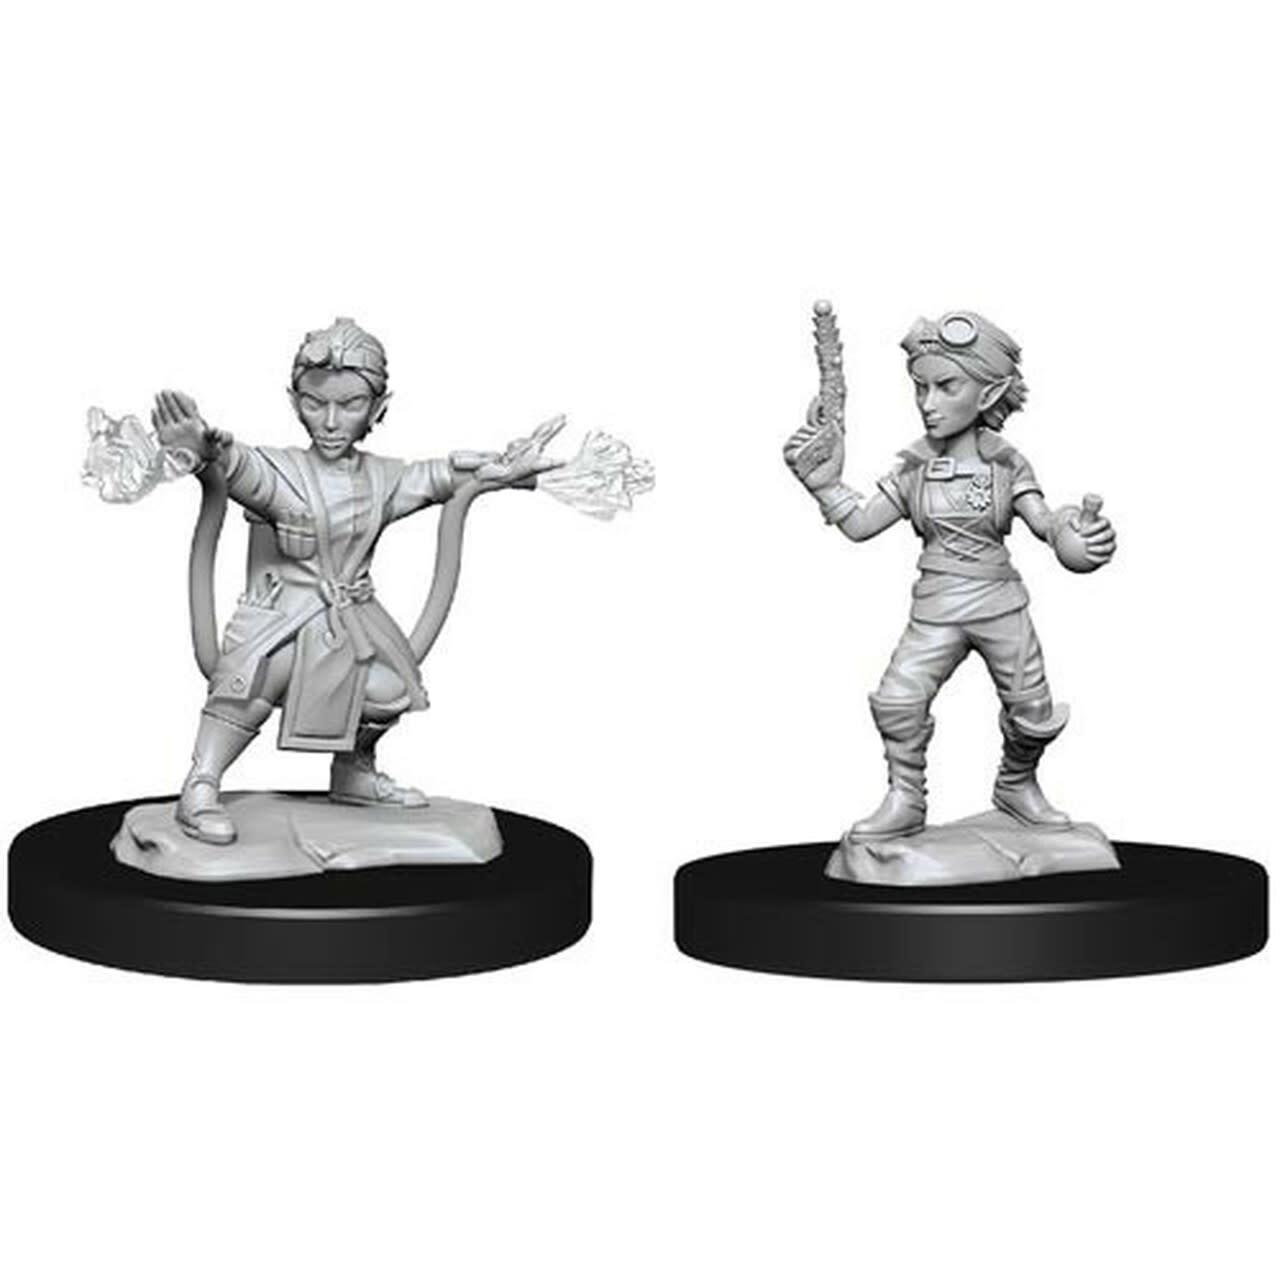 Wizkids D&D Nolzurs Miniatures: Gnome Artificer Female